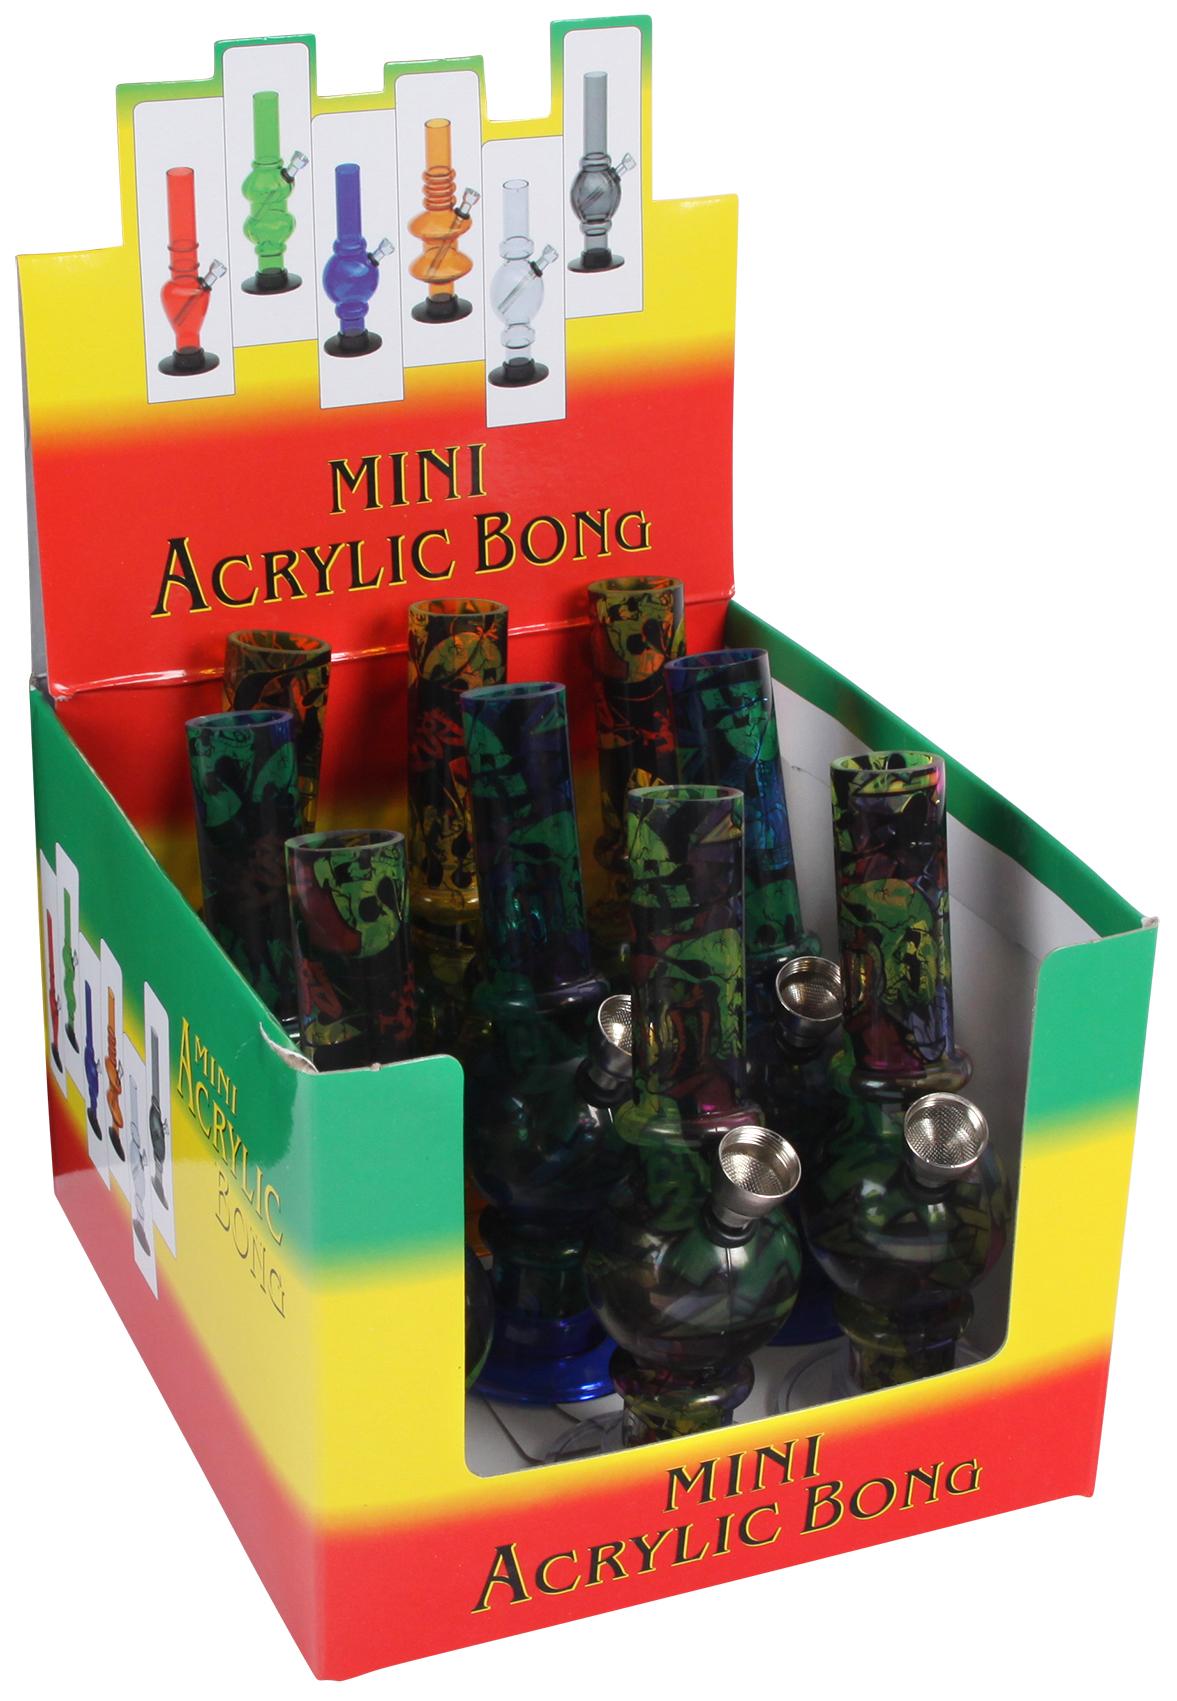 Acryl Bong mini printed